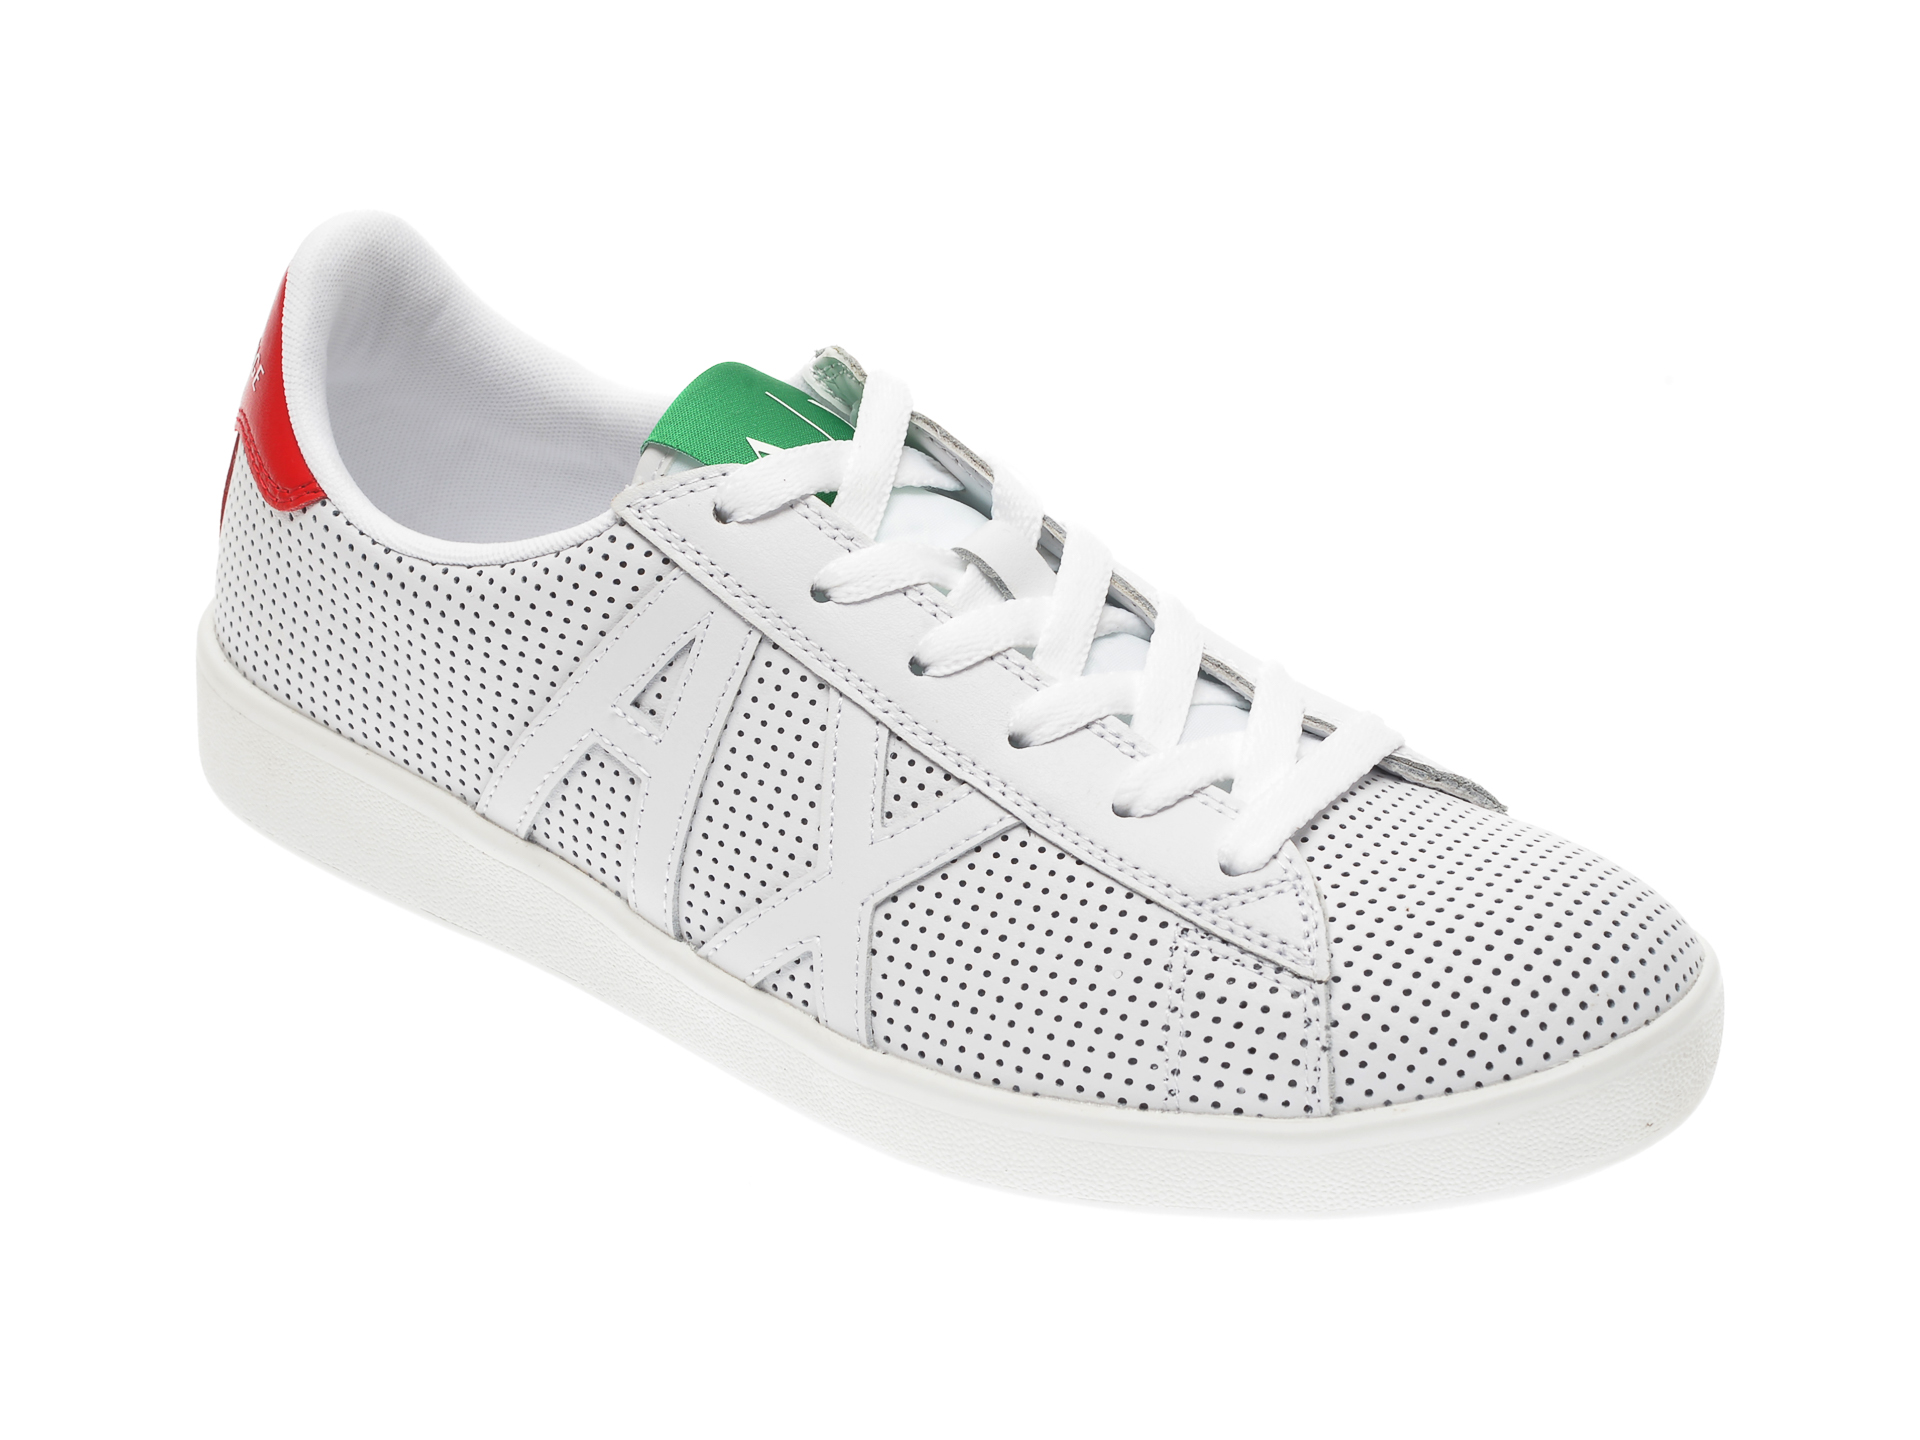 Pantofi ARMANI EXCHANGE albi, XUX016, din piele ecologica imagine